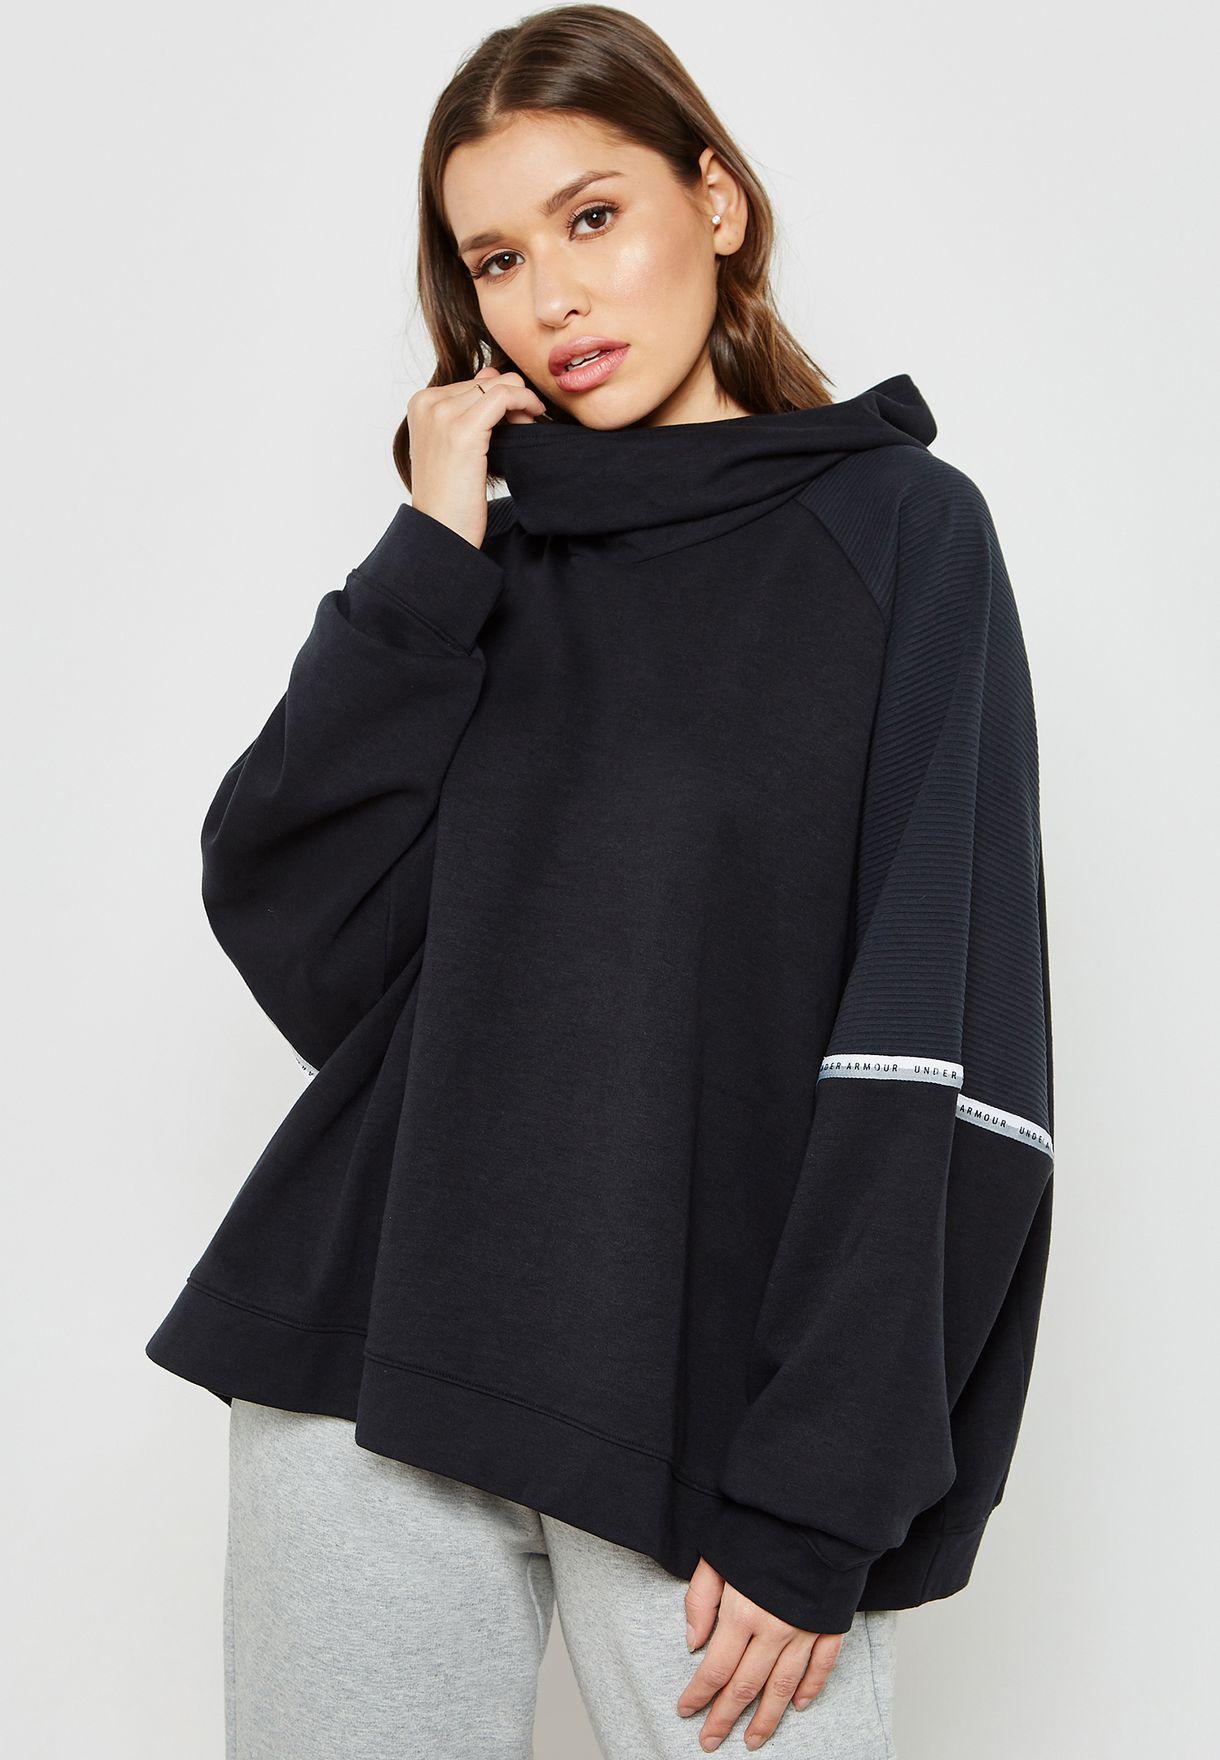 sensor Novedad nacionalismo  Buy Under Armour black Unstoppable Oversized Hoodie for Women in MENA,  Worldwide | 1328226-001